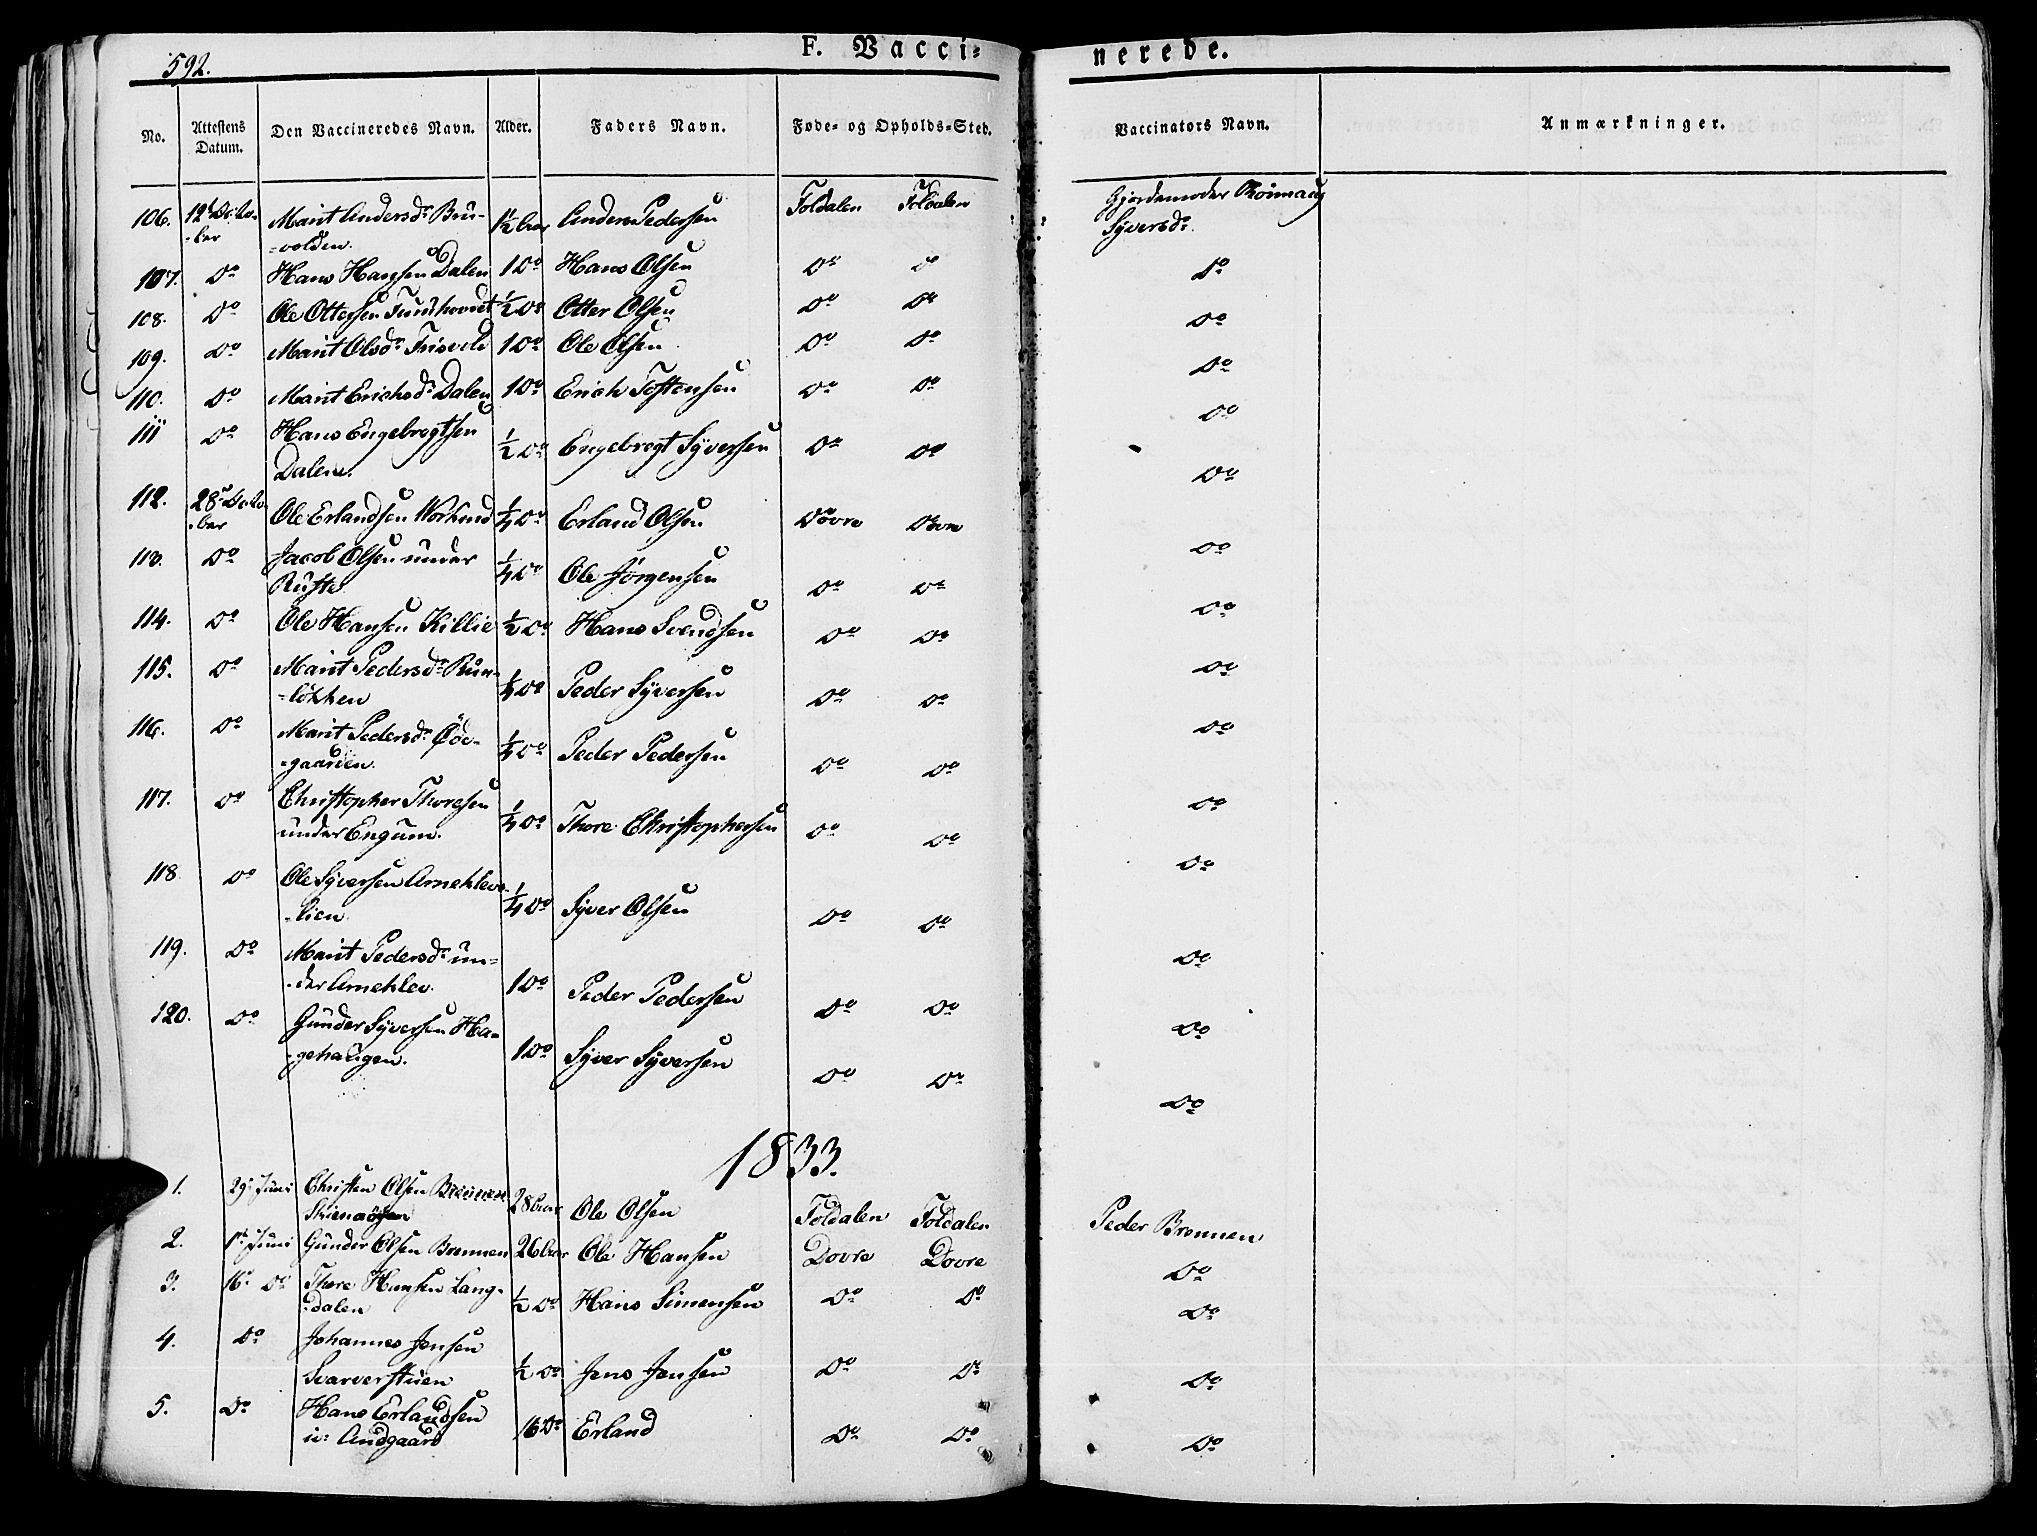 SAH, Lesja prestekontor, Ministerialbok nr. 5, 1830-1842, s. 592